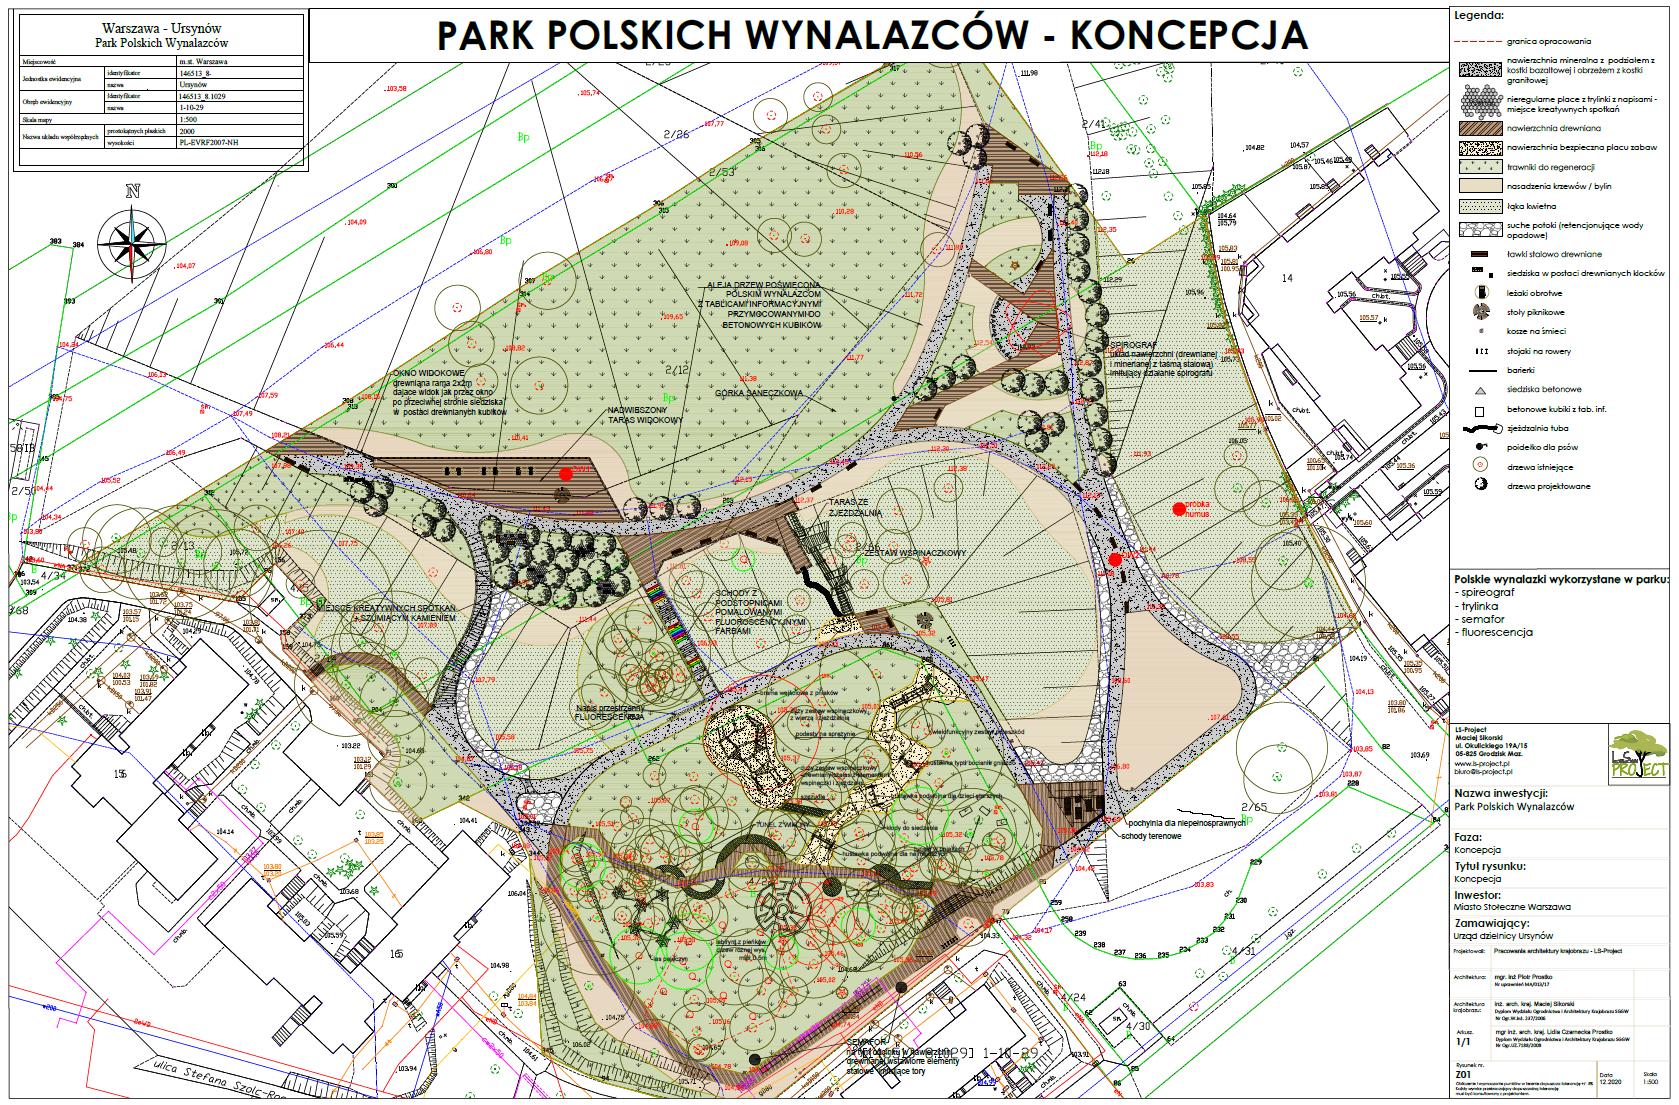 fot.ursynow.pl